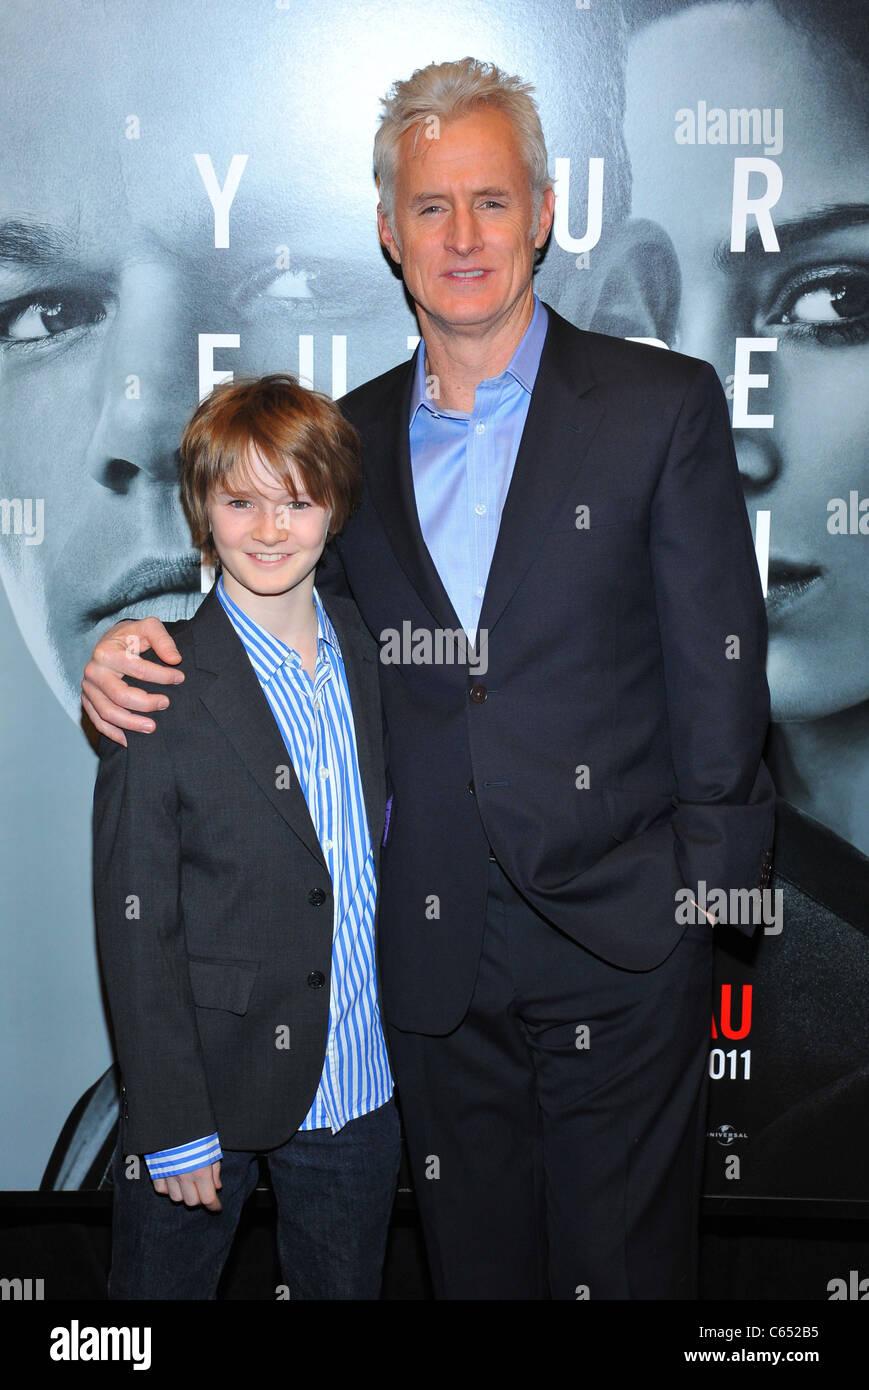 American actor John Slattery 87